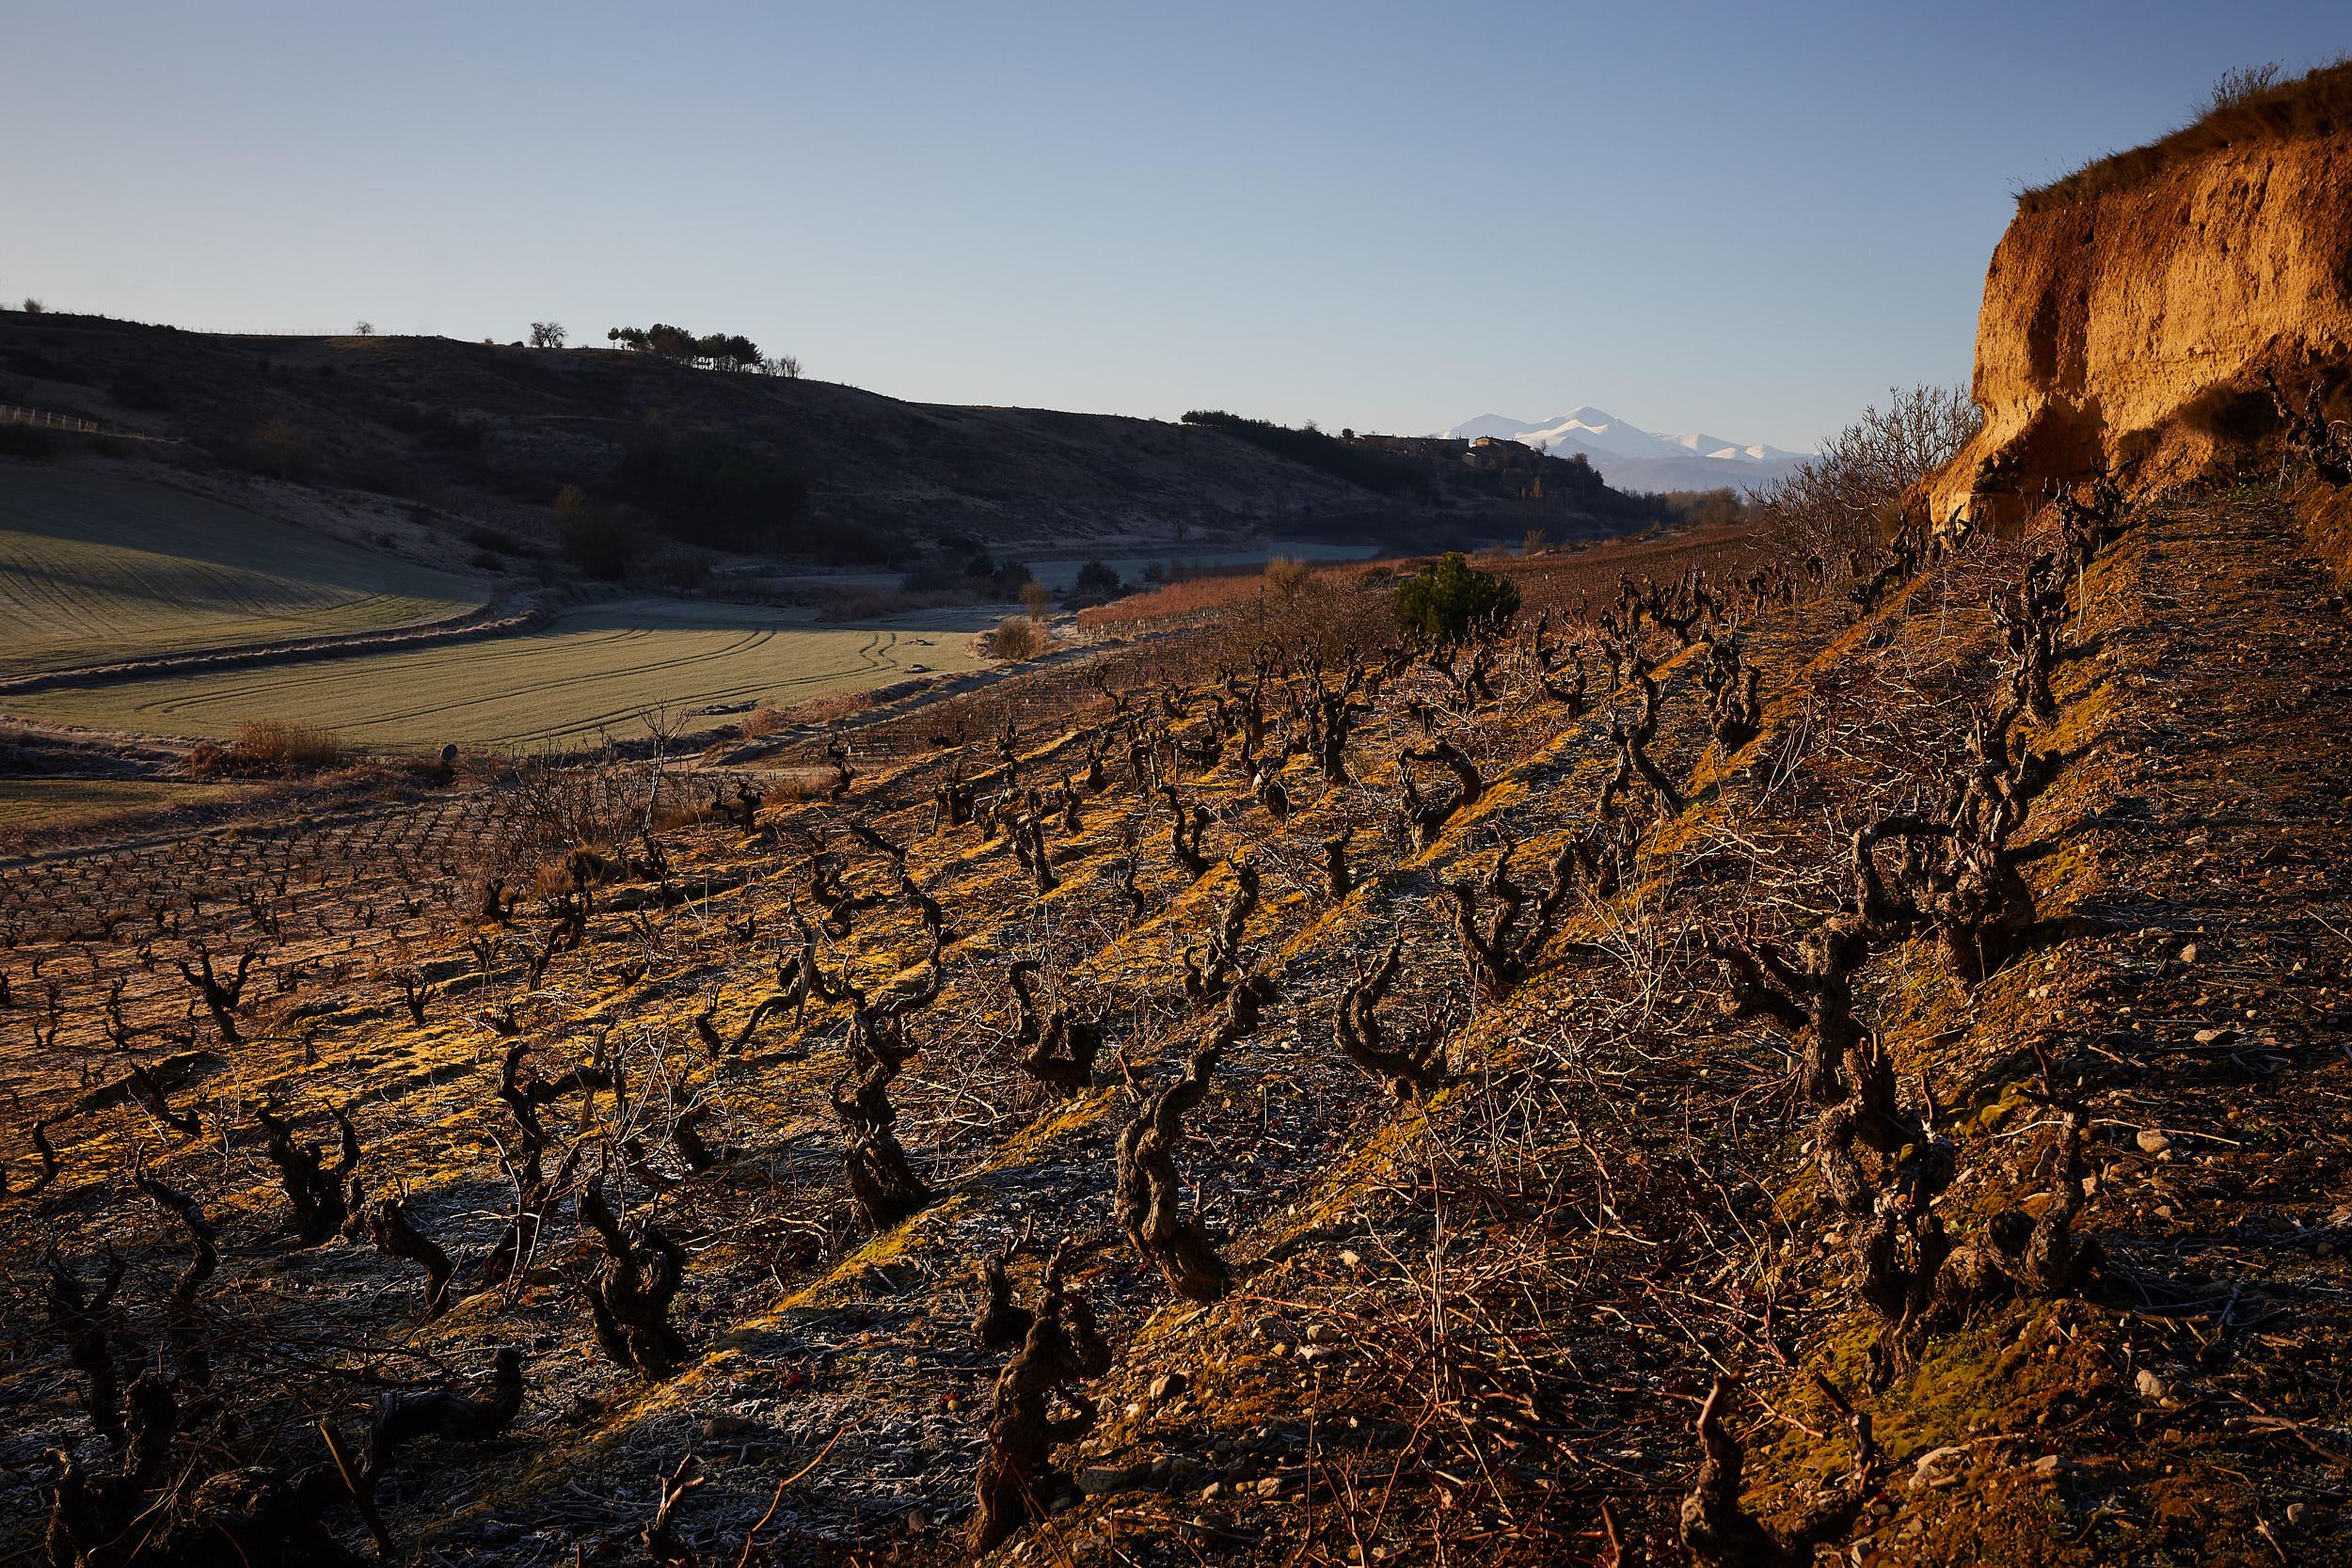 1801Commercial-professional-wine-photography-la-rioja-spain-James-Sturcke_0006.jpg